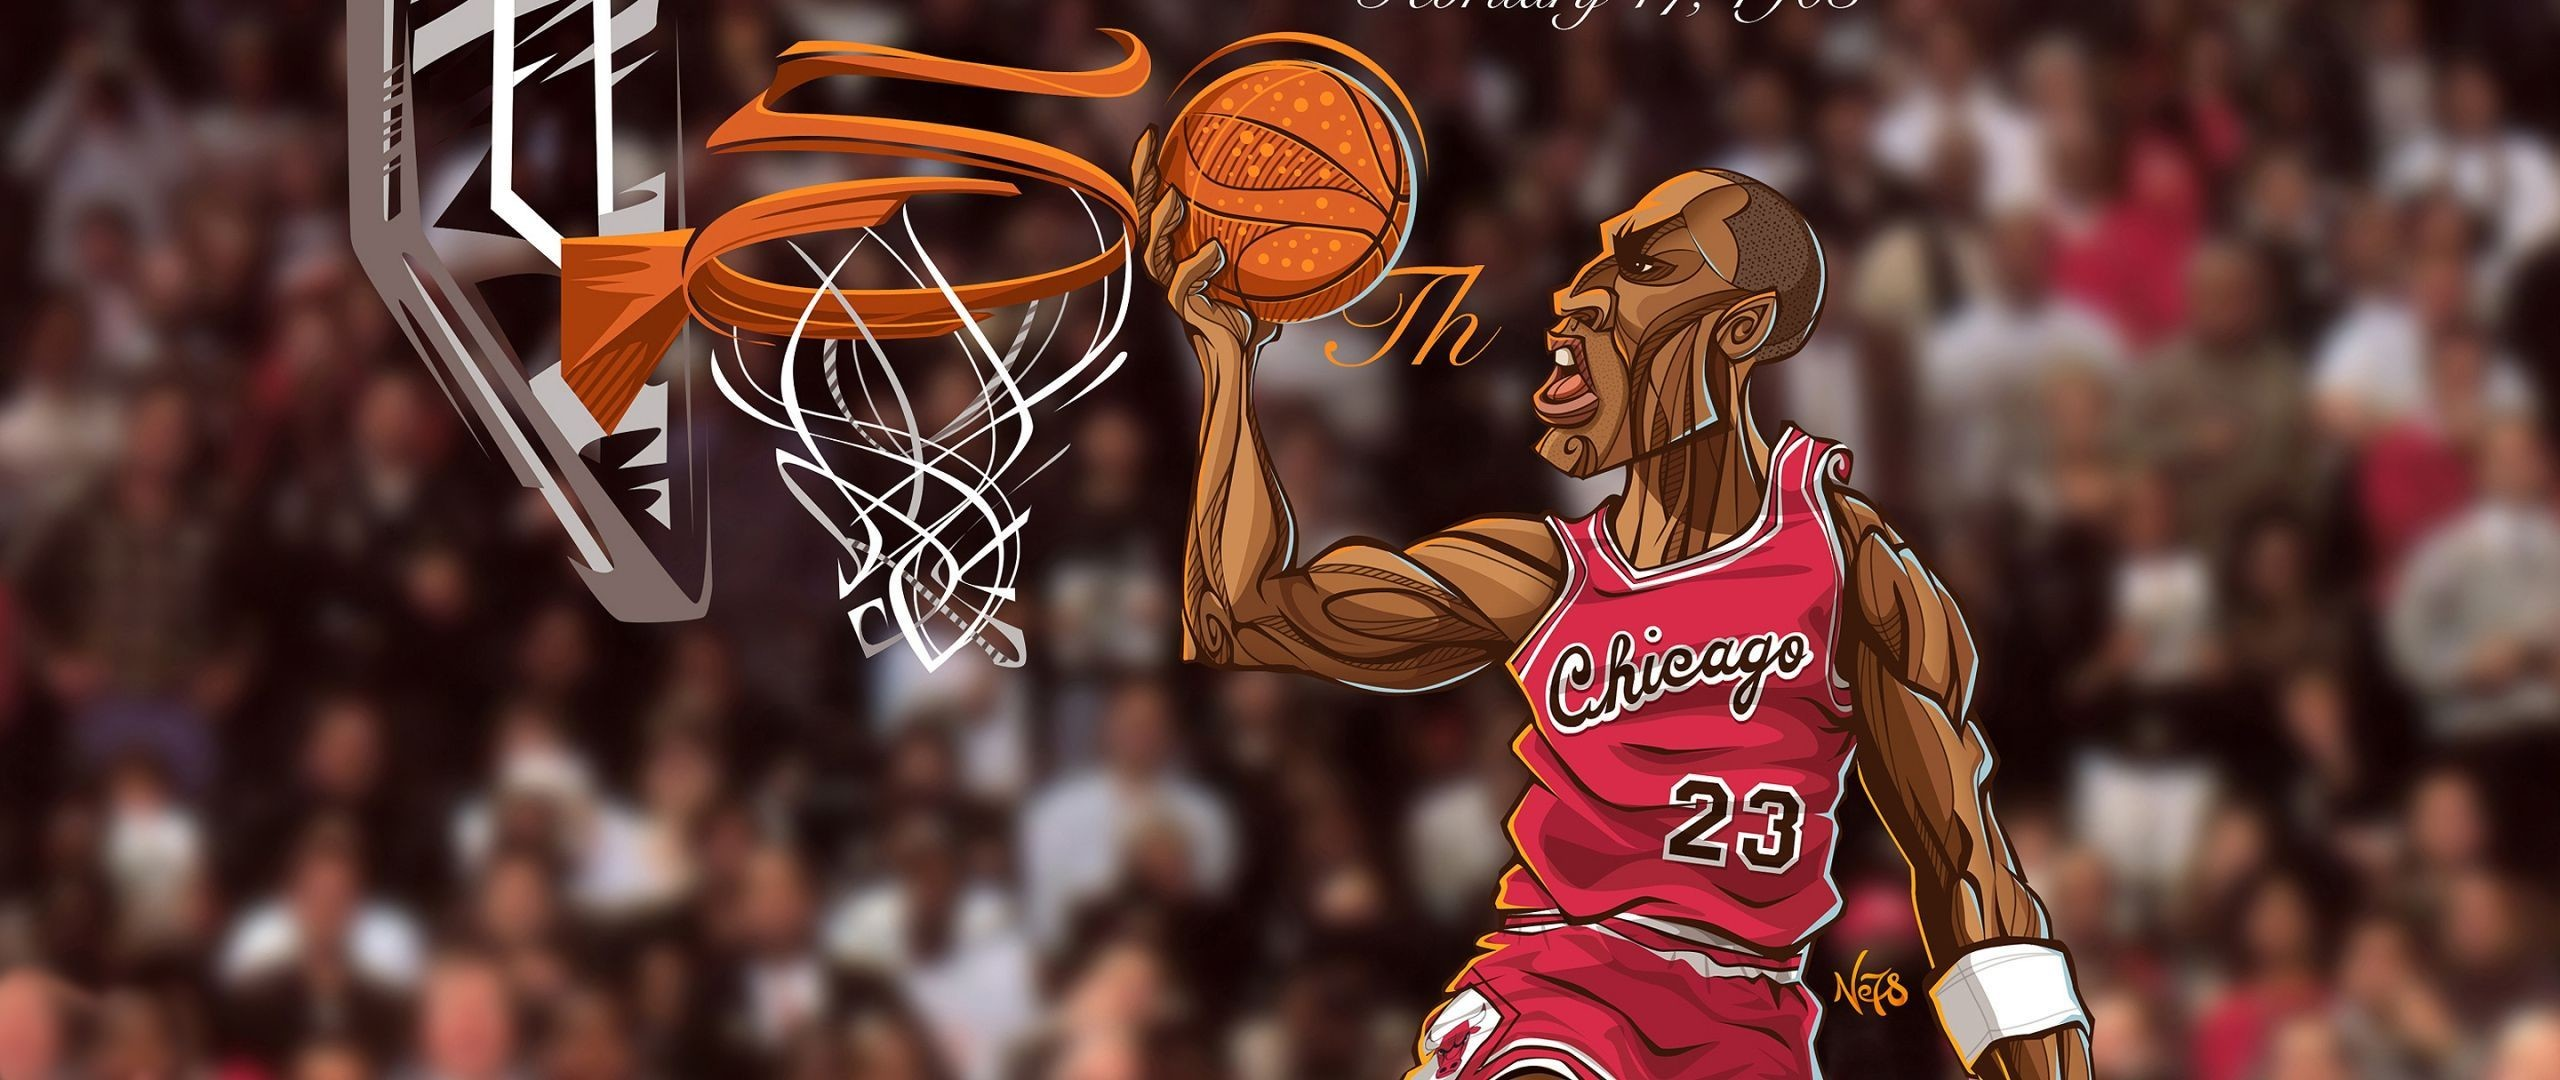 Download Wallpaper Michael jordan, Chicago bulls, Sports .